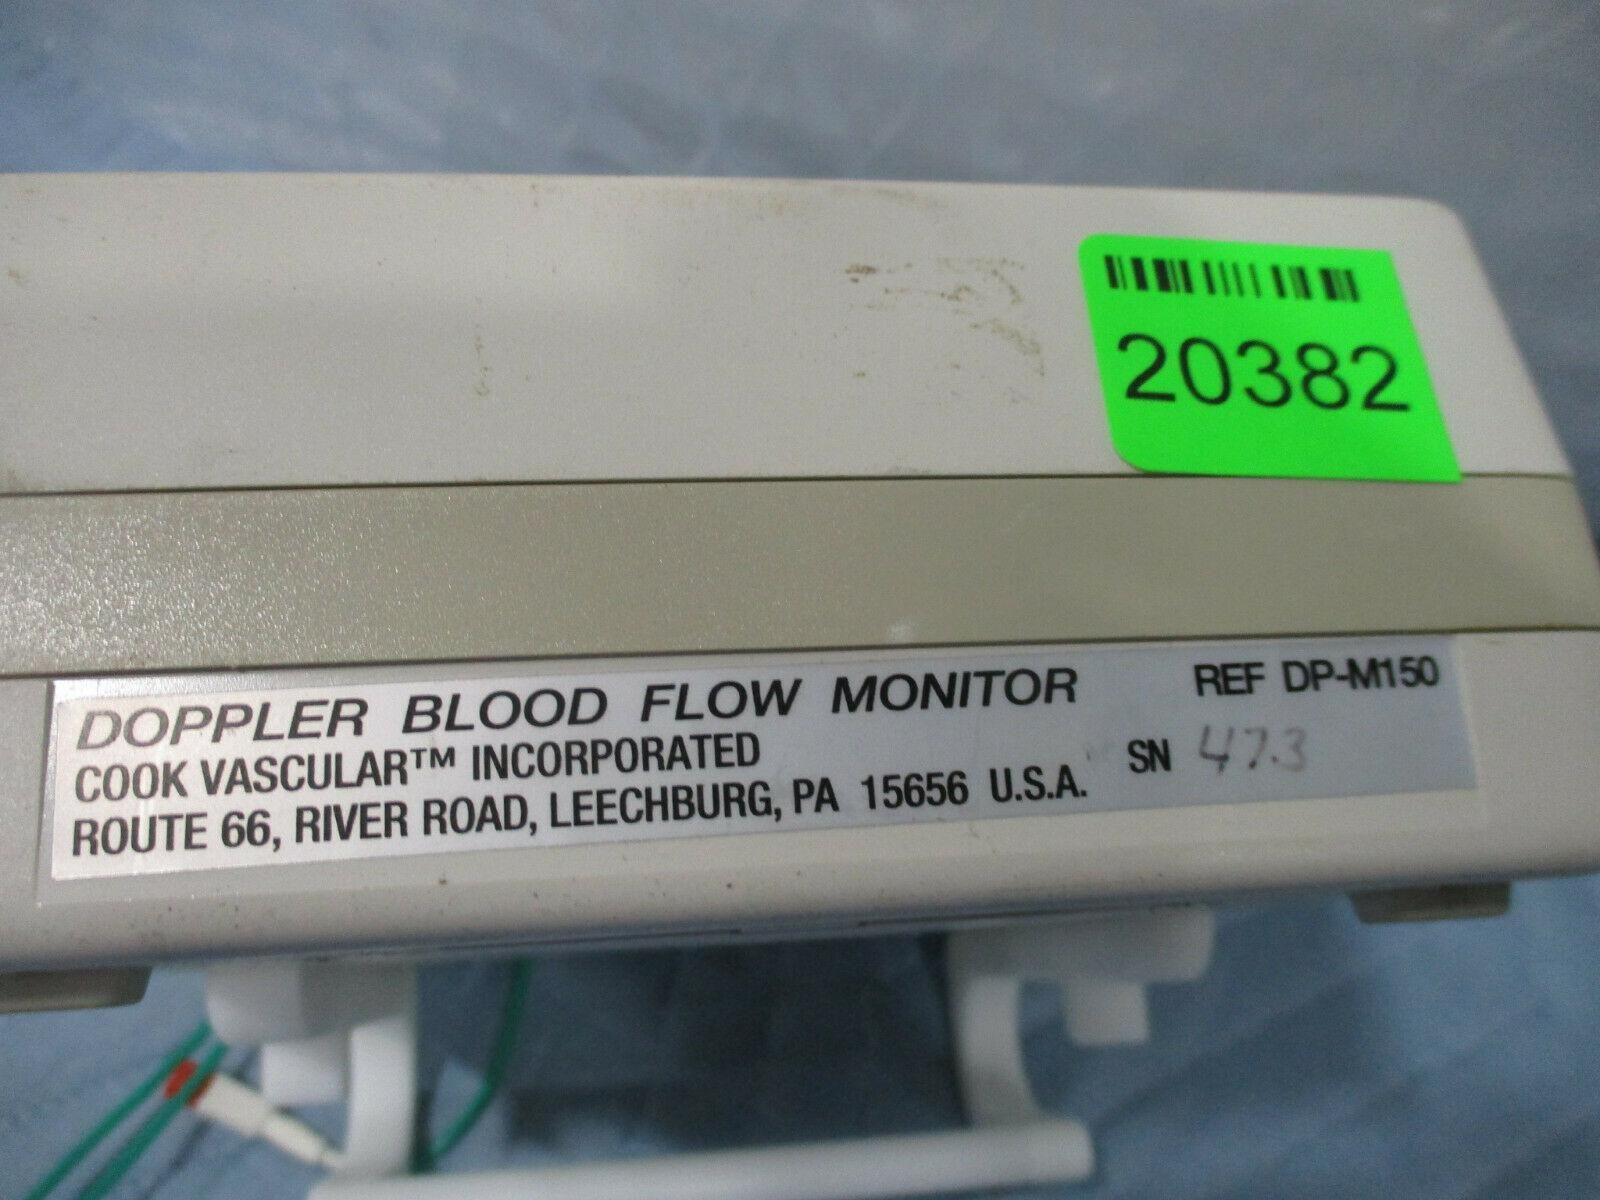 Cook Vascular Doppler Blood Flow Monitor DP-M150